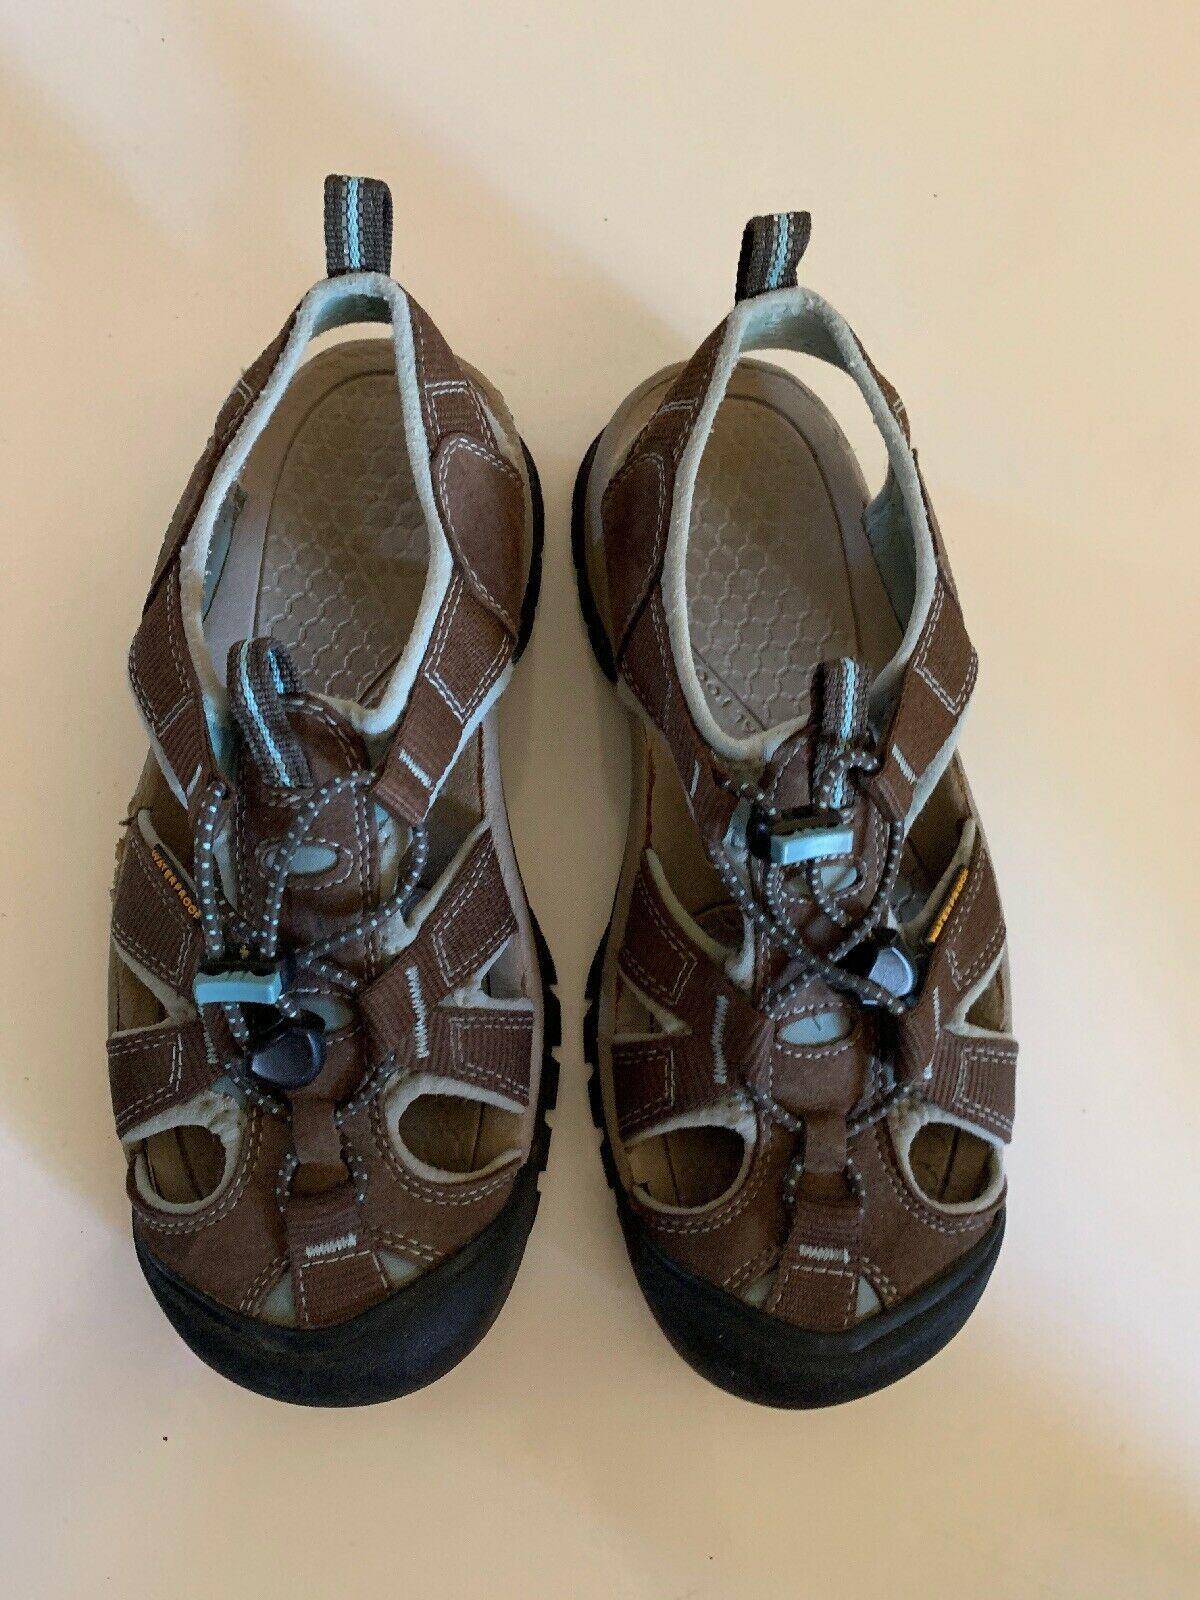 Women's Keen Sport Sandals Size 7 Water Shoes 1008020 Waterproof brown image 10